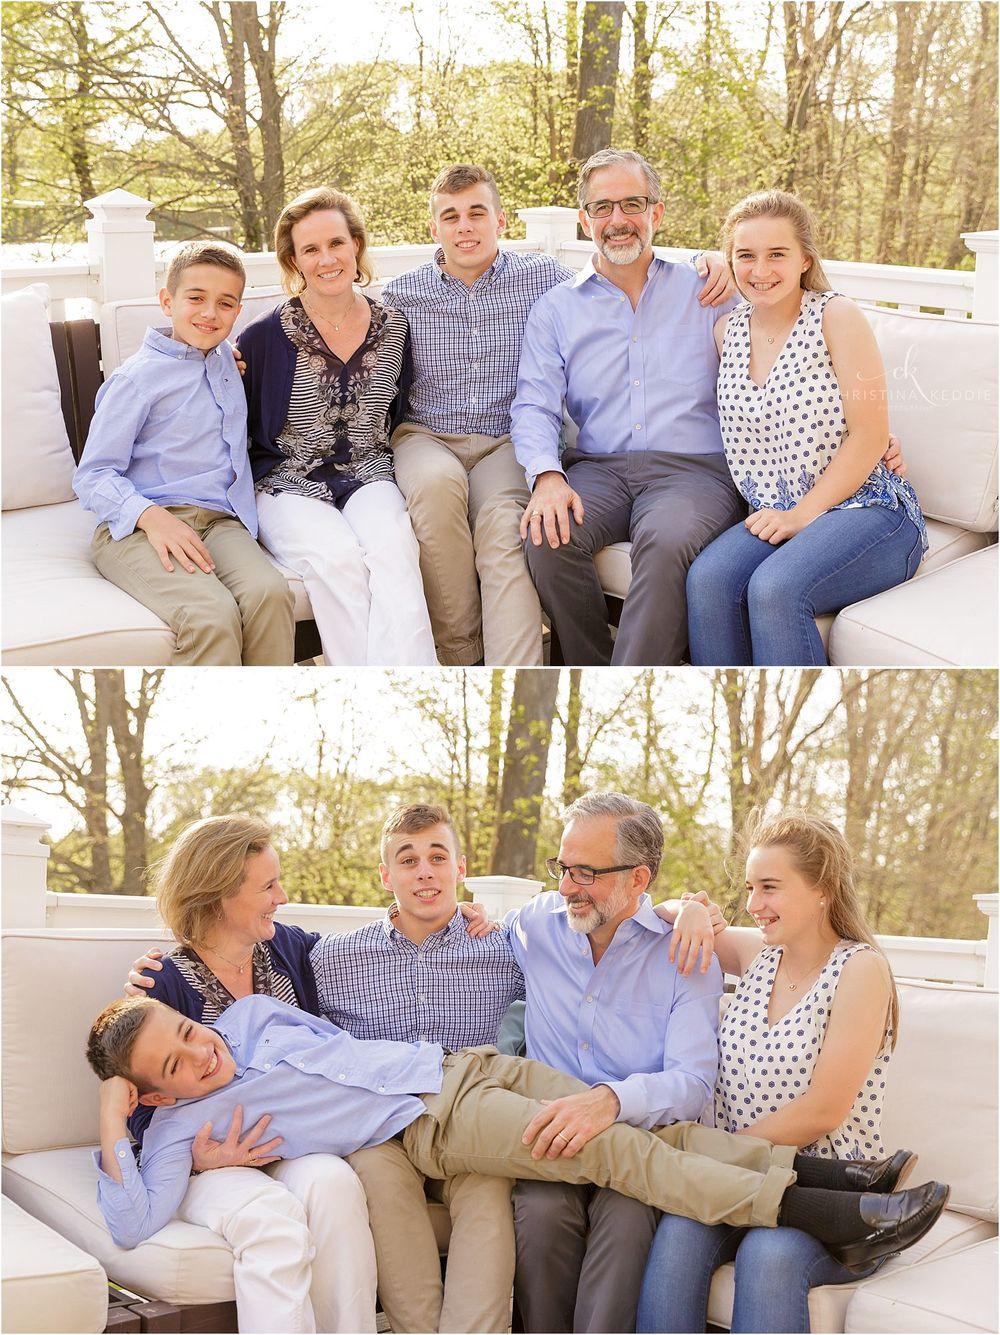 Family portraits on patio overlooking lake   Christina Keddie Photography   Skillman NJ family photographer